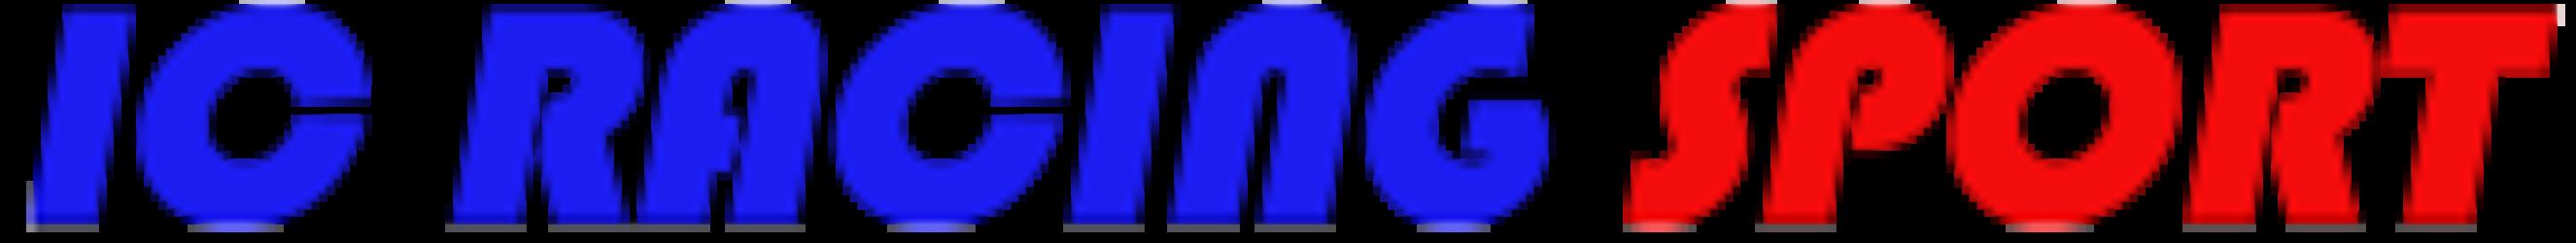 Ic Racing – COSASDECOCHES – COSASDETALLER